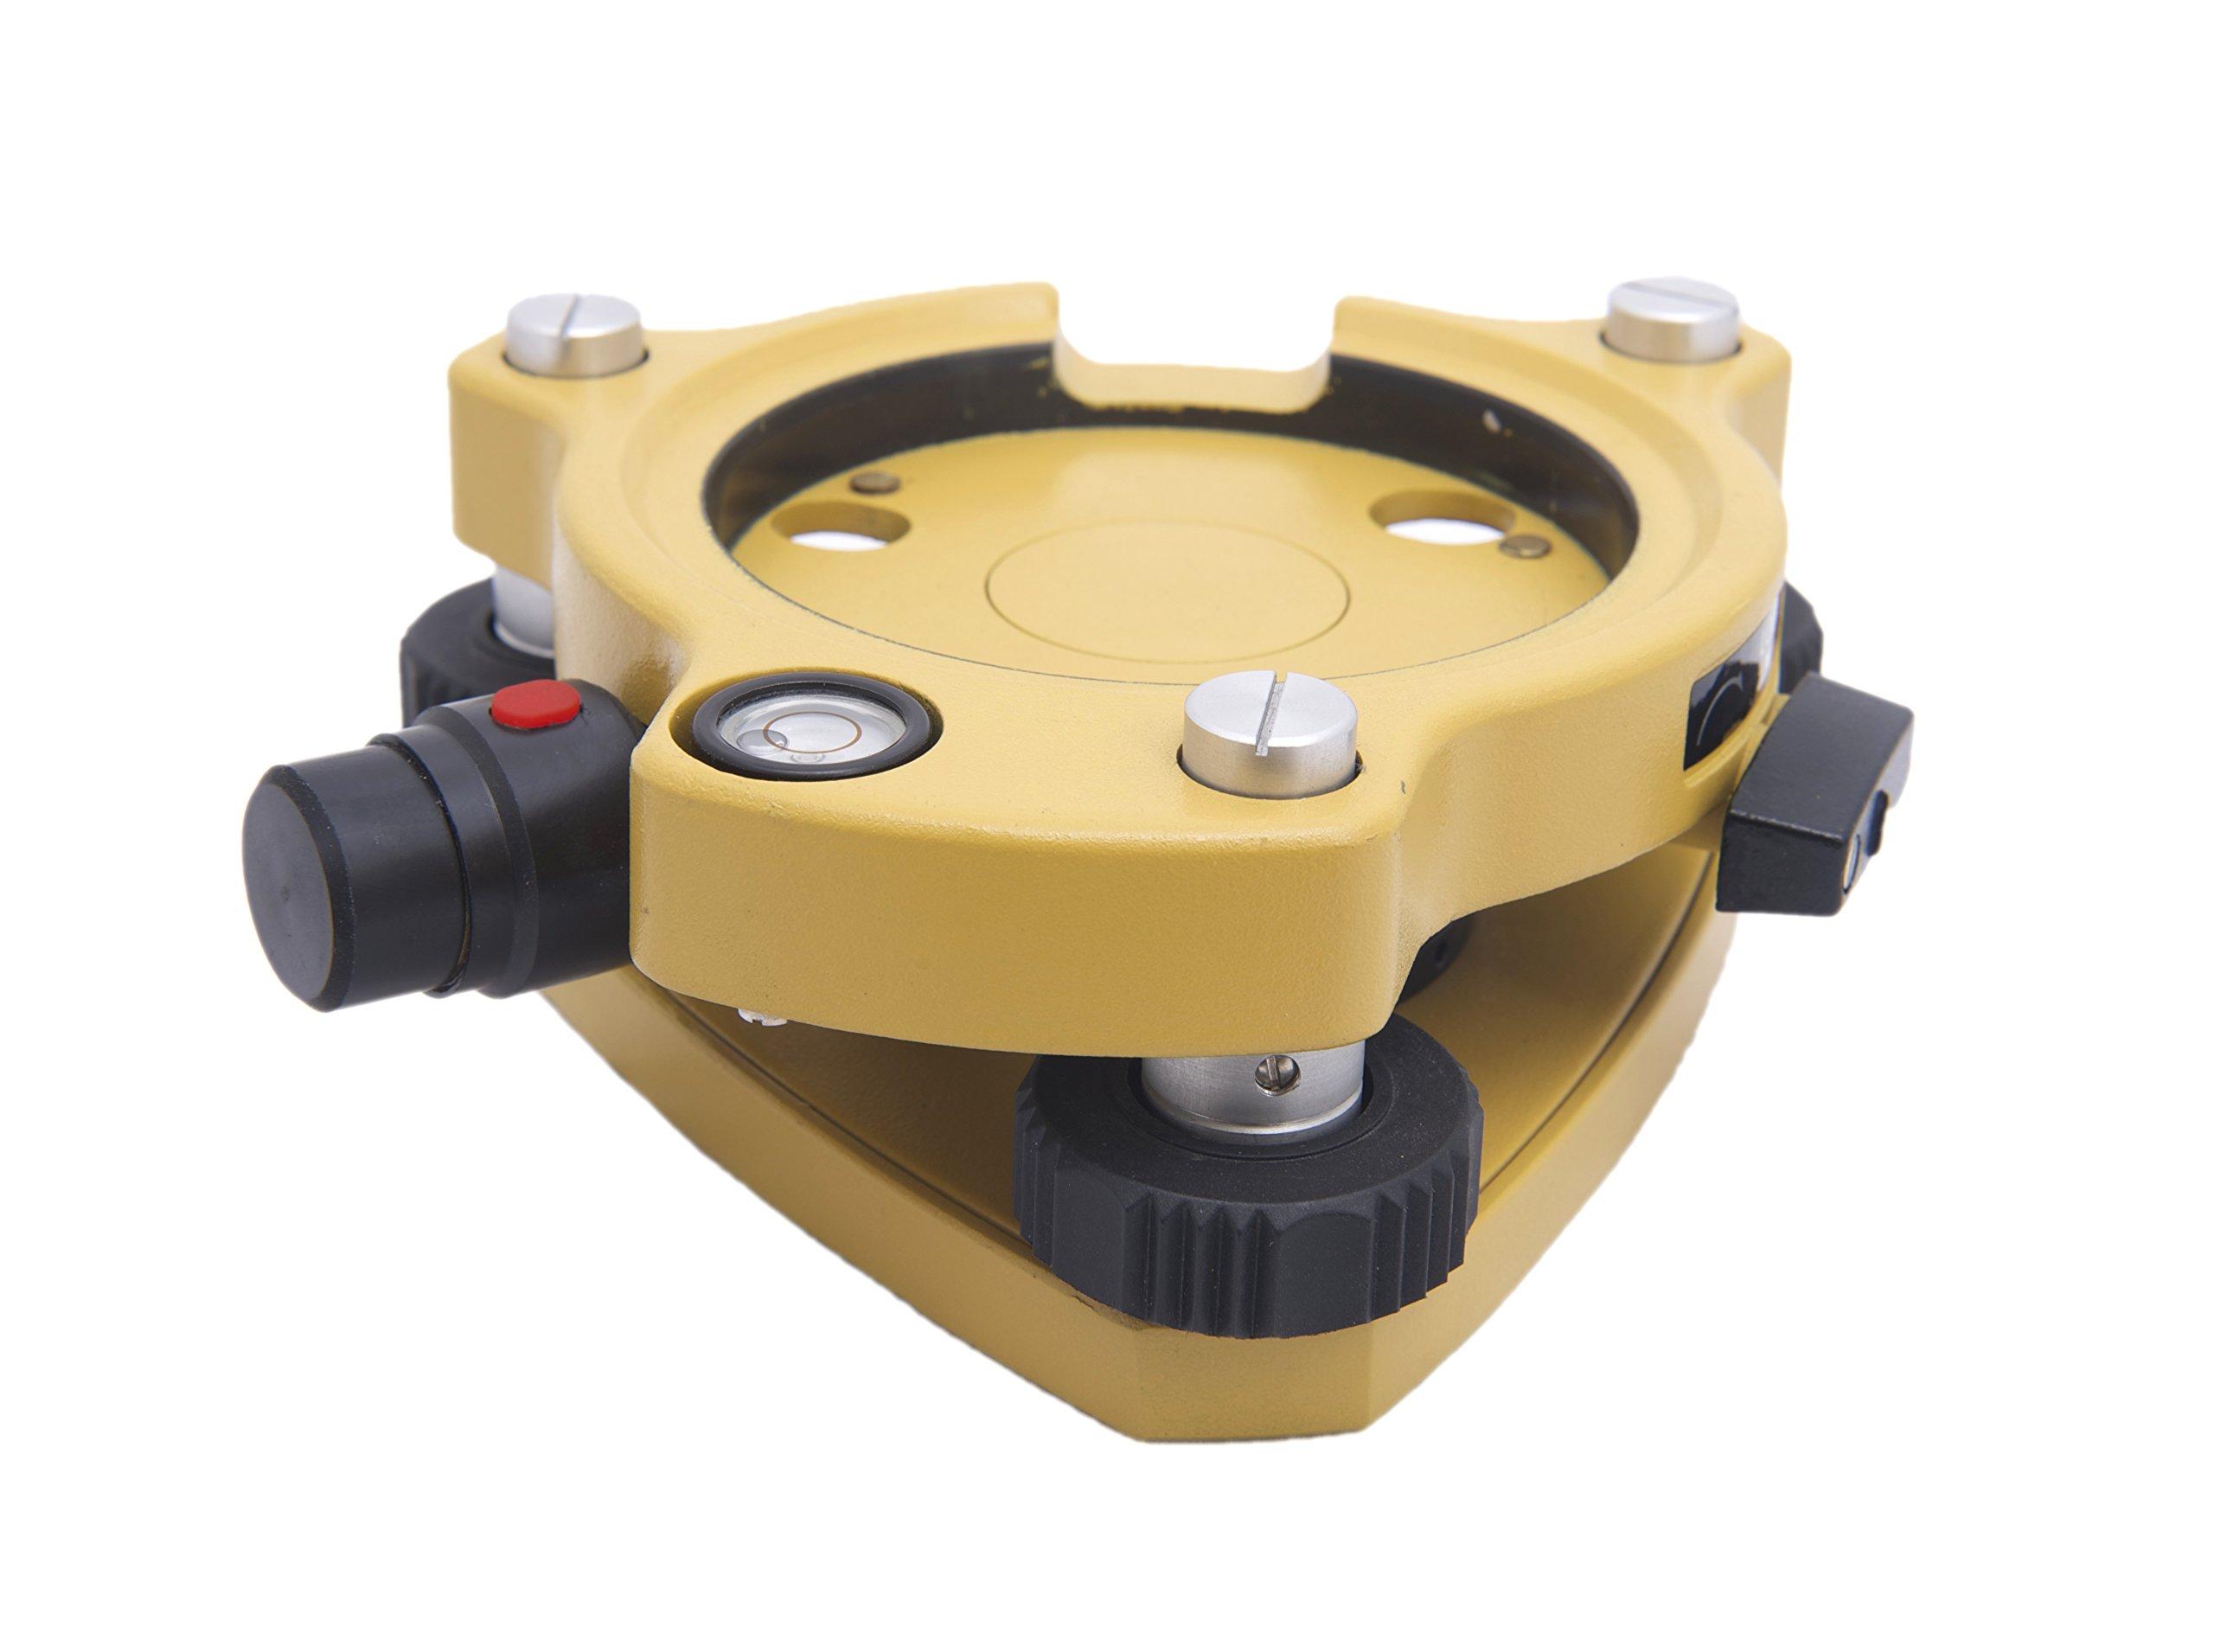 AdirPro Tribrach with Laser Plummet (Yellow)